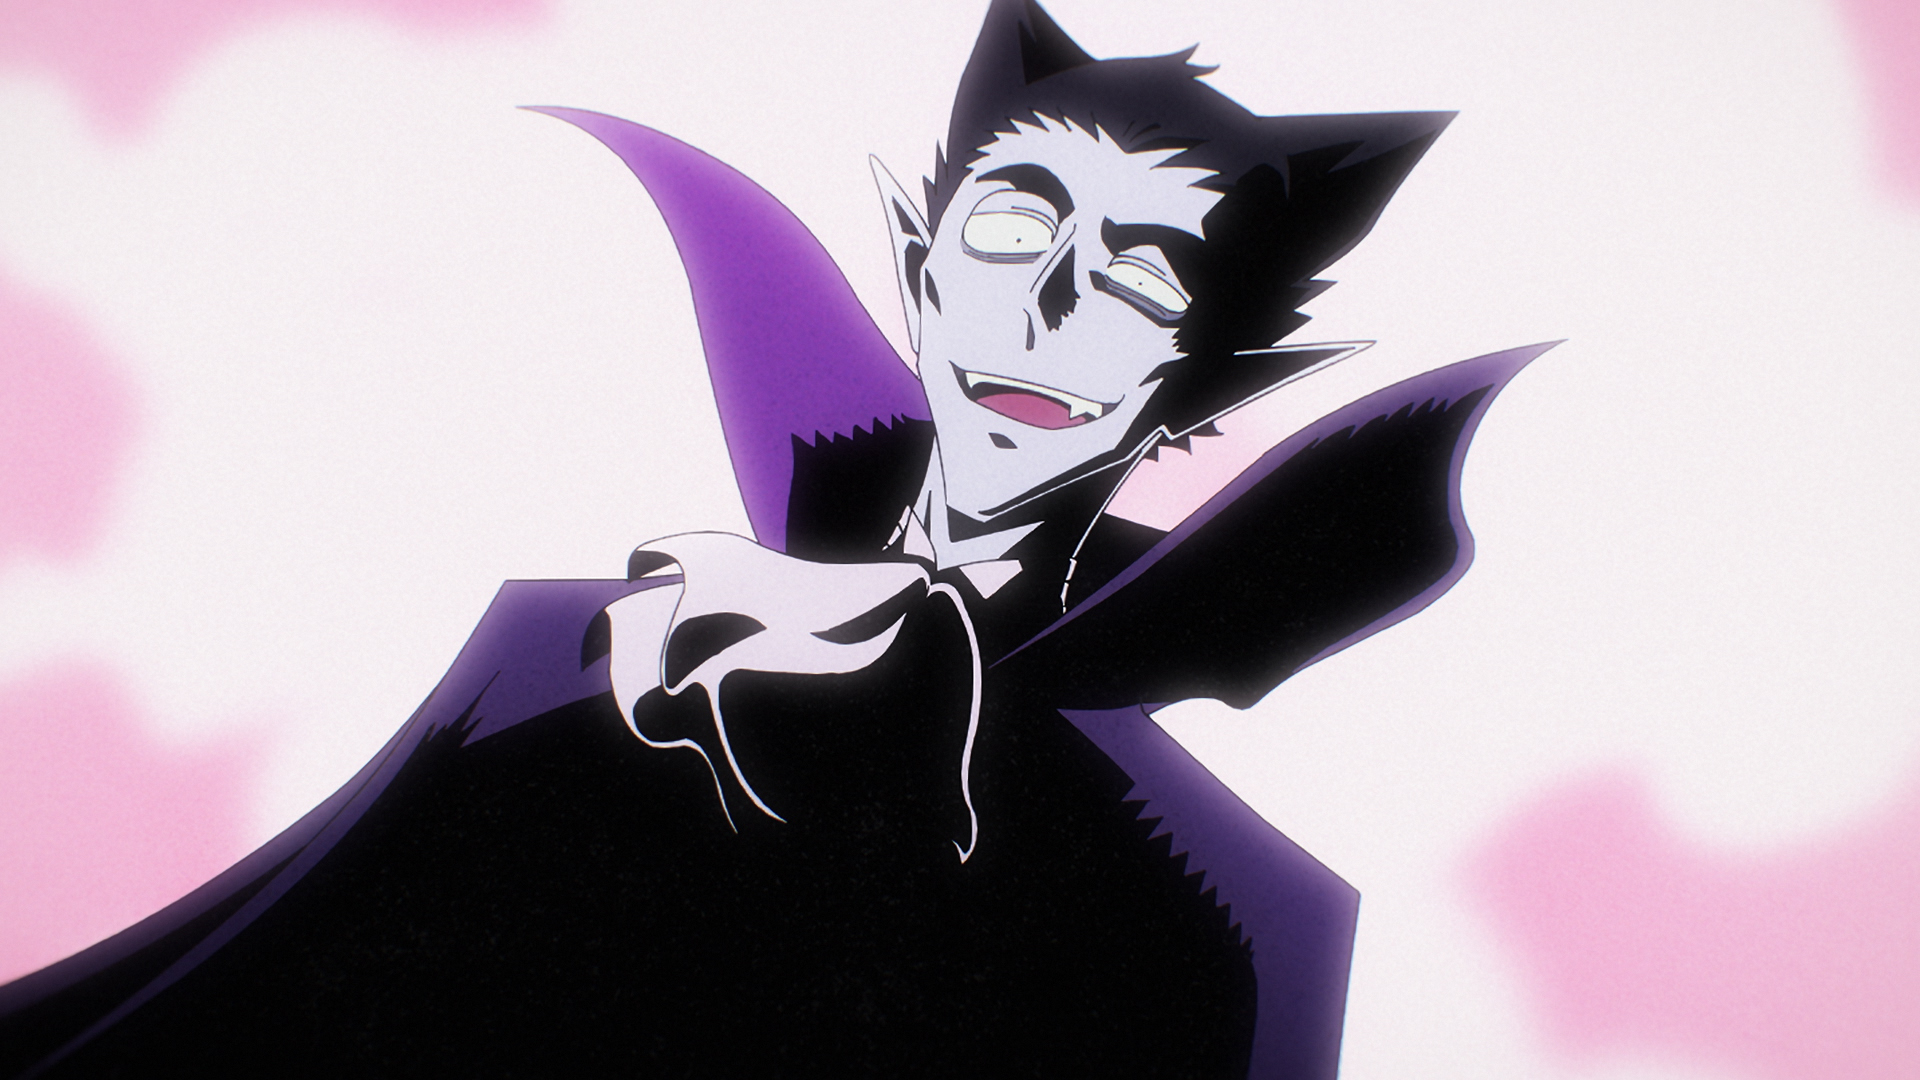 TVアニメ「吸血鬼すぐ死ぬ」ティザーPV9